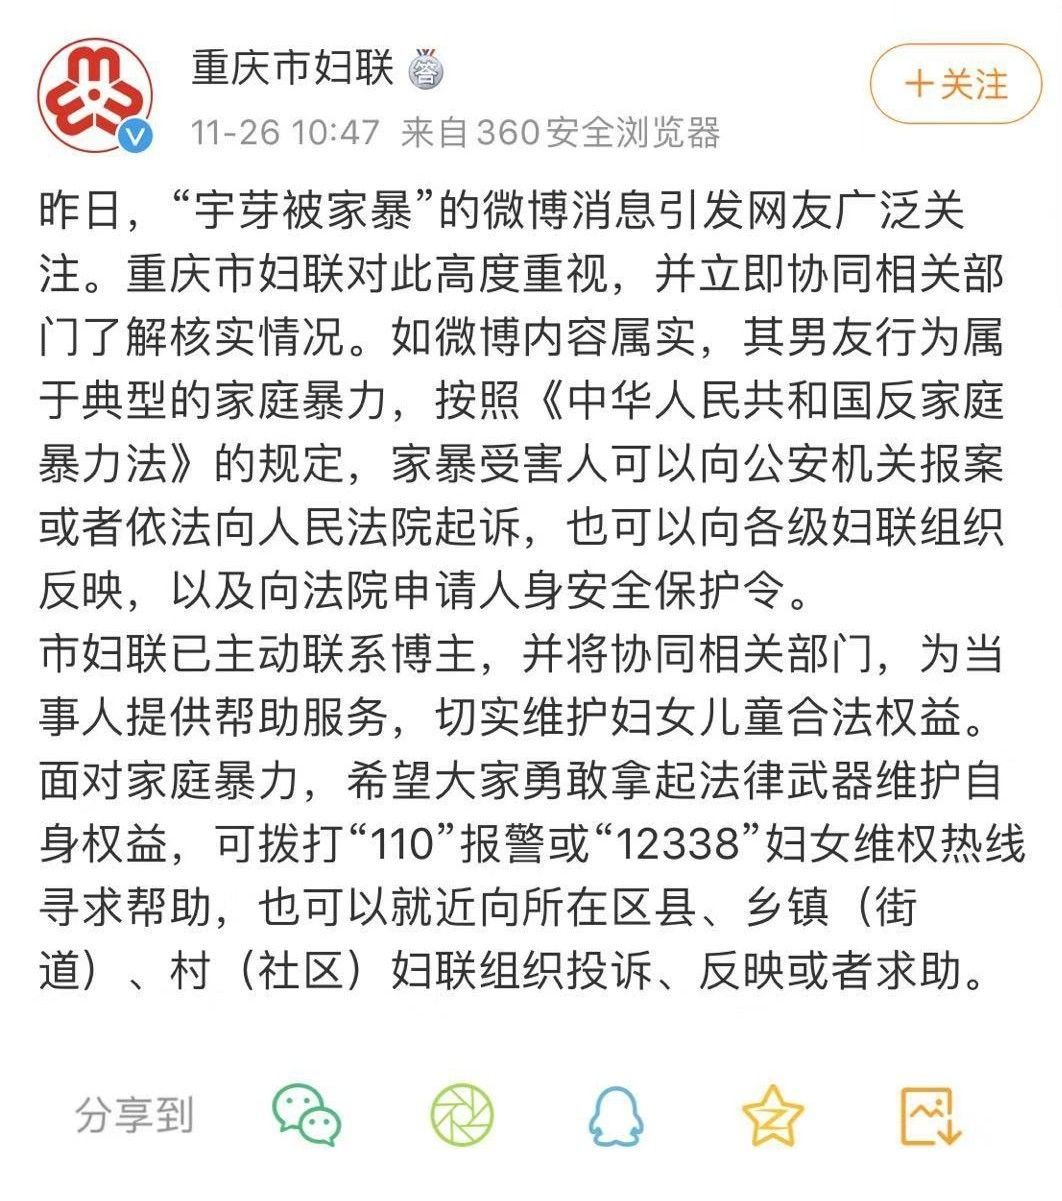 papi酱公司旗下艺人自曝被家暴,网友怒了!警方妇联介入调查